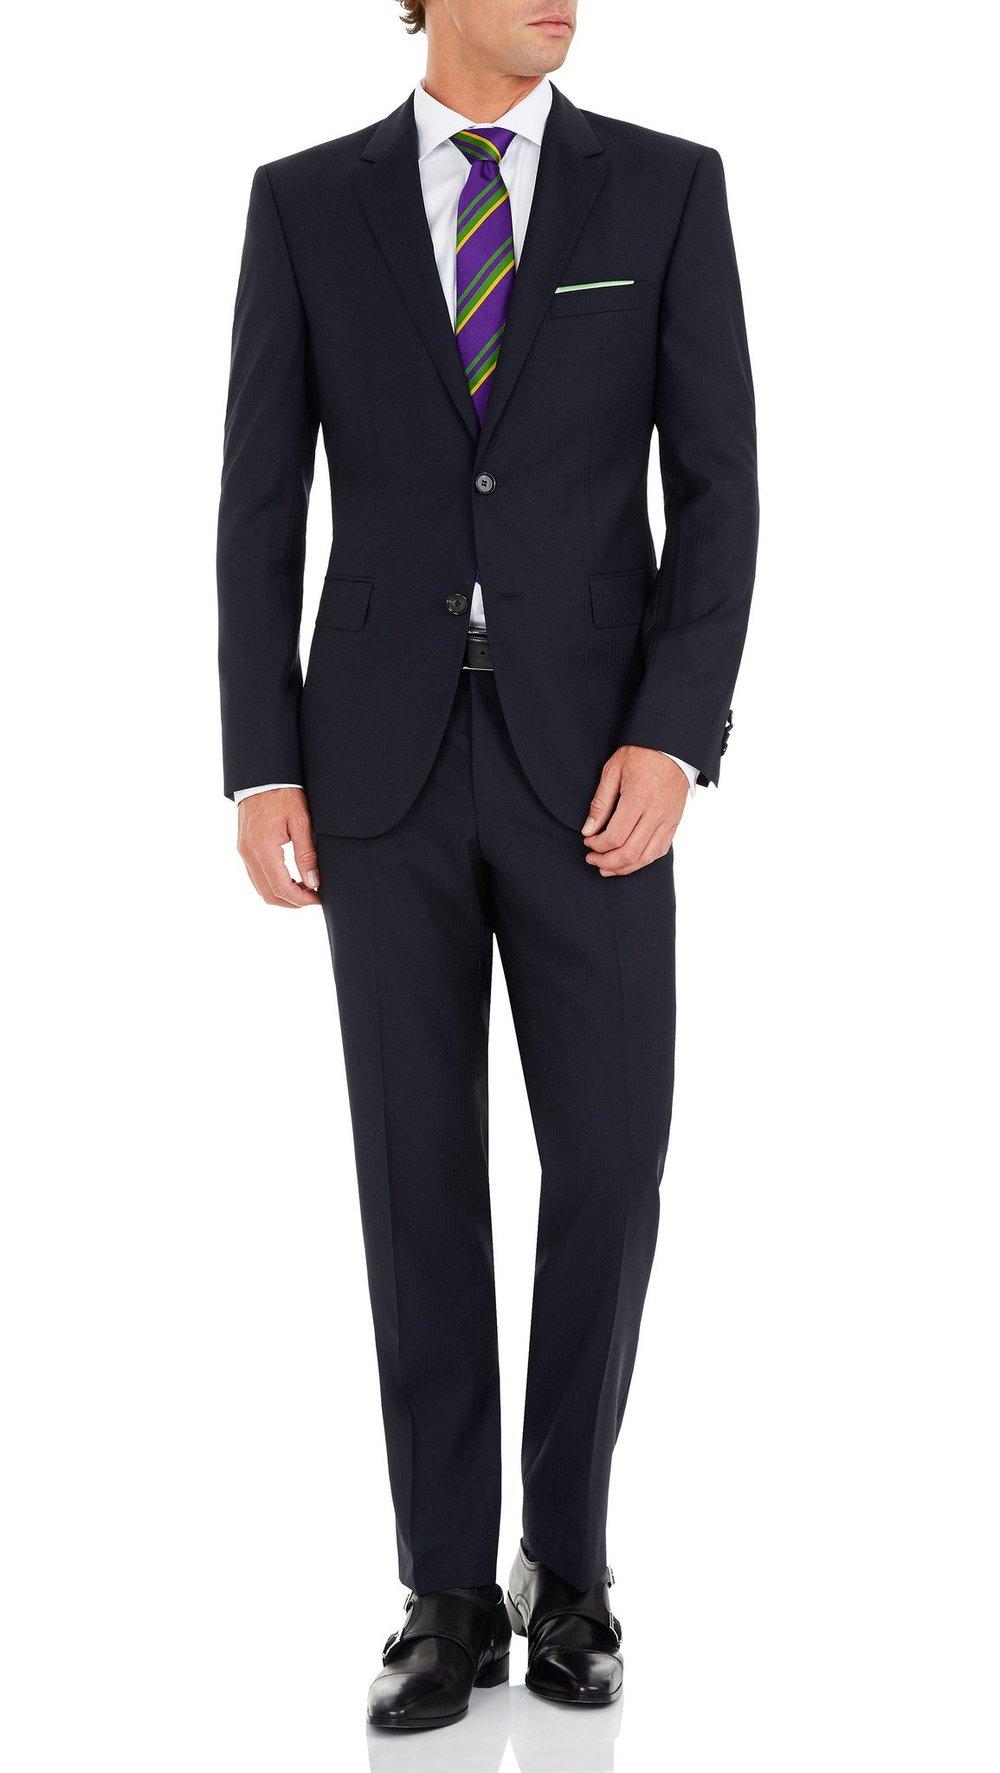 b24f39d6b Hugo Boss James/Sharp Suit in Navy — Ron Bennett Menswear